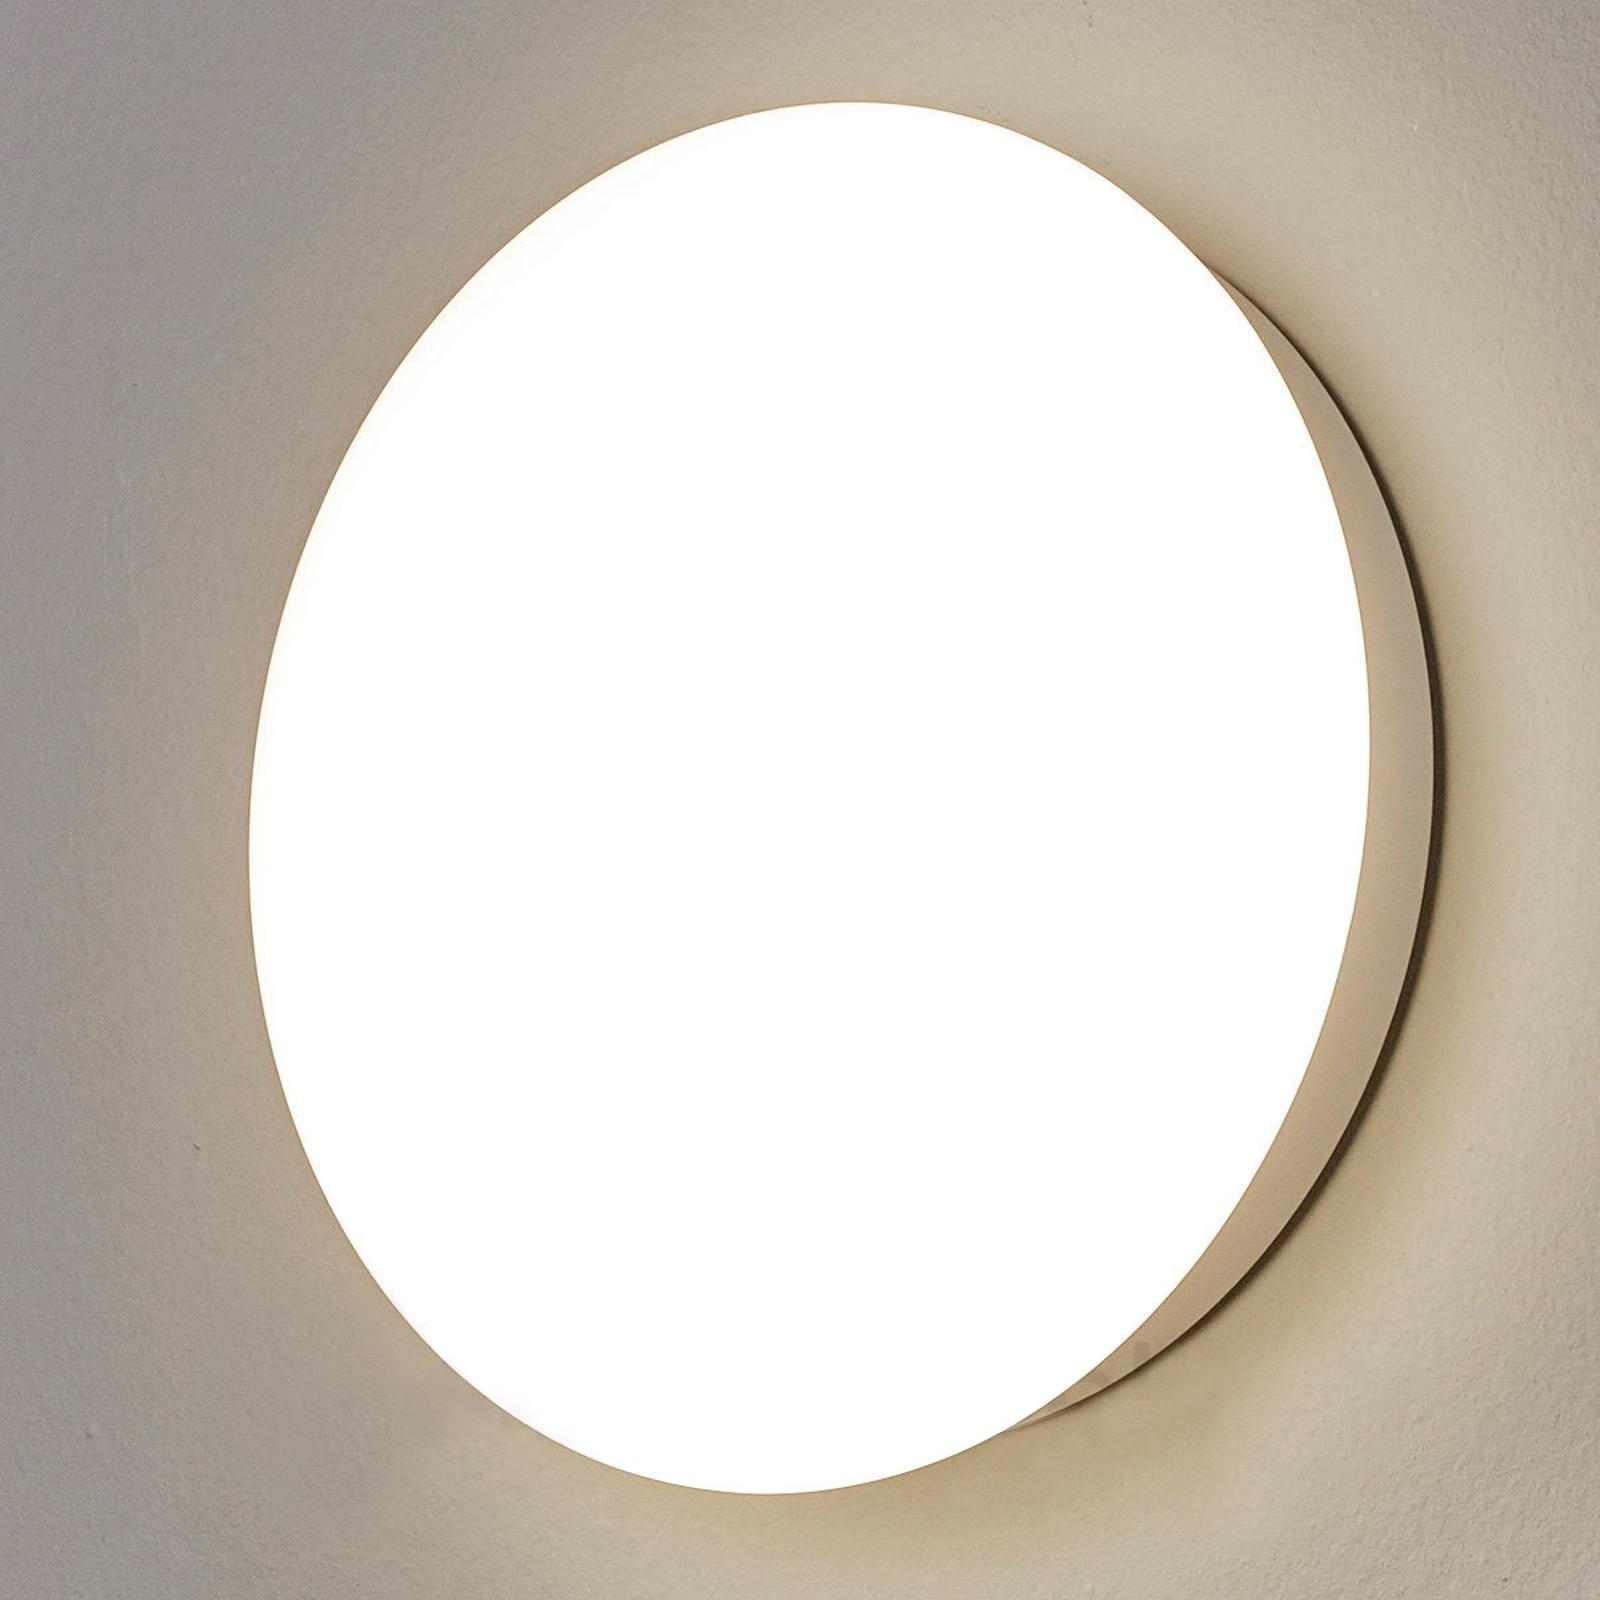 LED-Wandleuchte Sun 12 IP55, 18 W 4000K uw